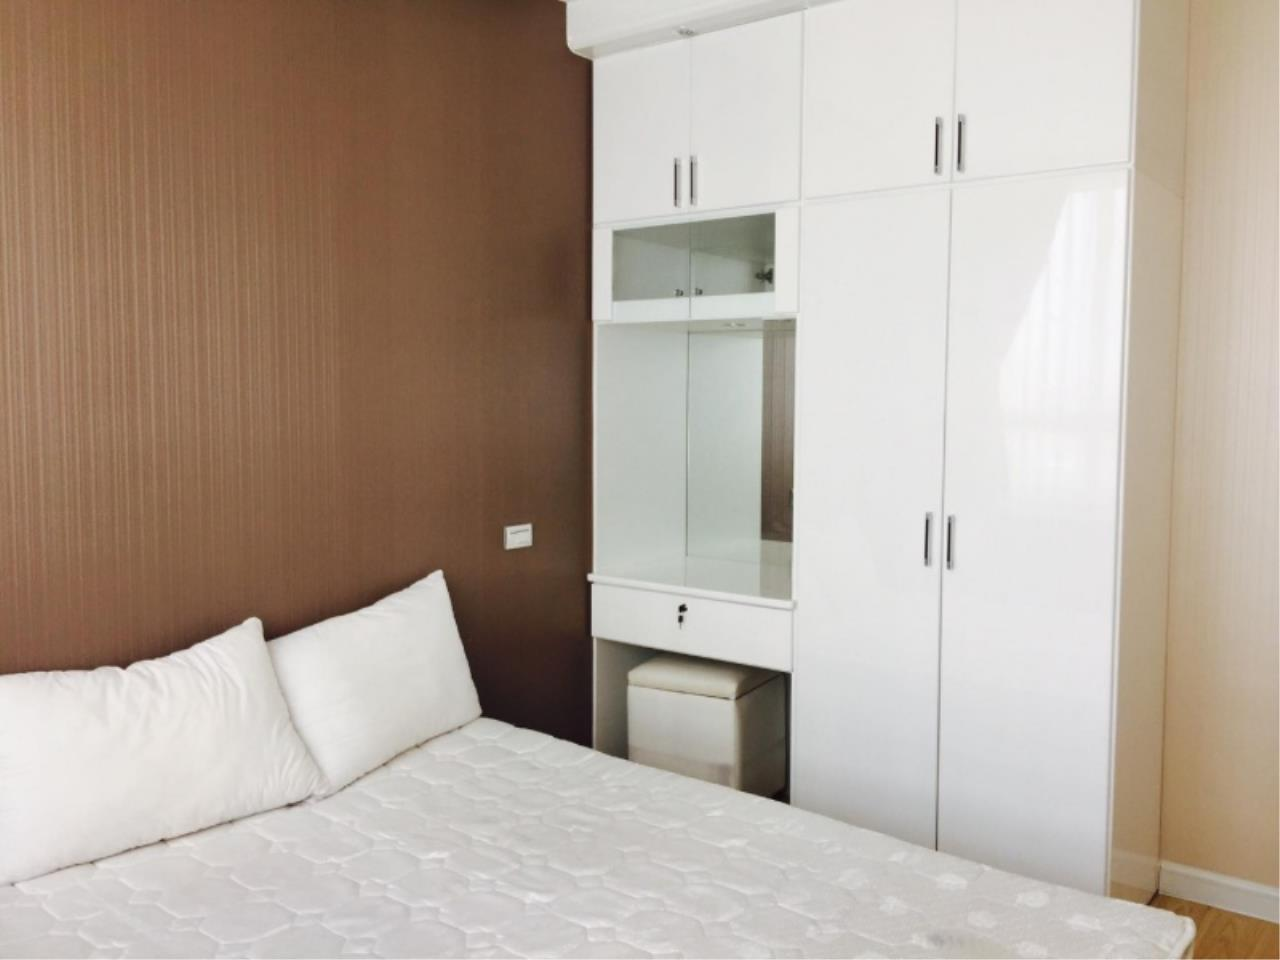 Century21 Skylux Agency's T.C. Green / Condo For Sale / 1 Bedroom / 35 SQM / MRT Phra Ram 9 / Bangkok 4